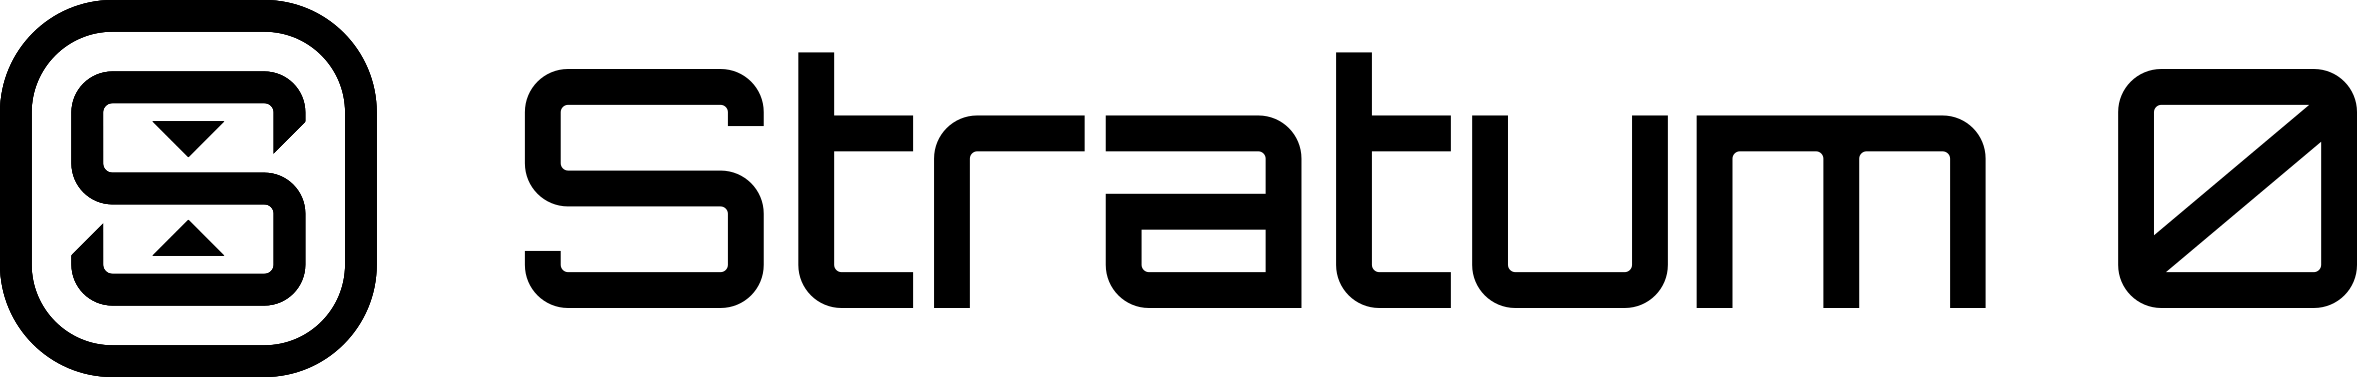 Stratum0Varianten/Stratum0_furutre-text_right.png